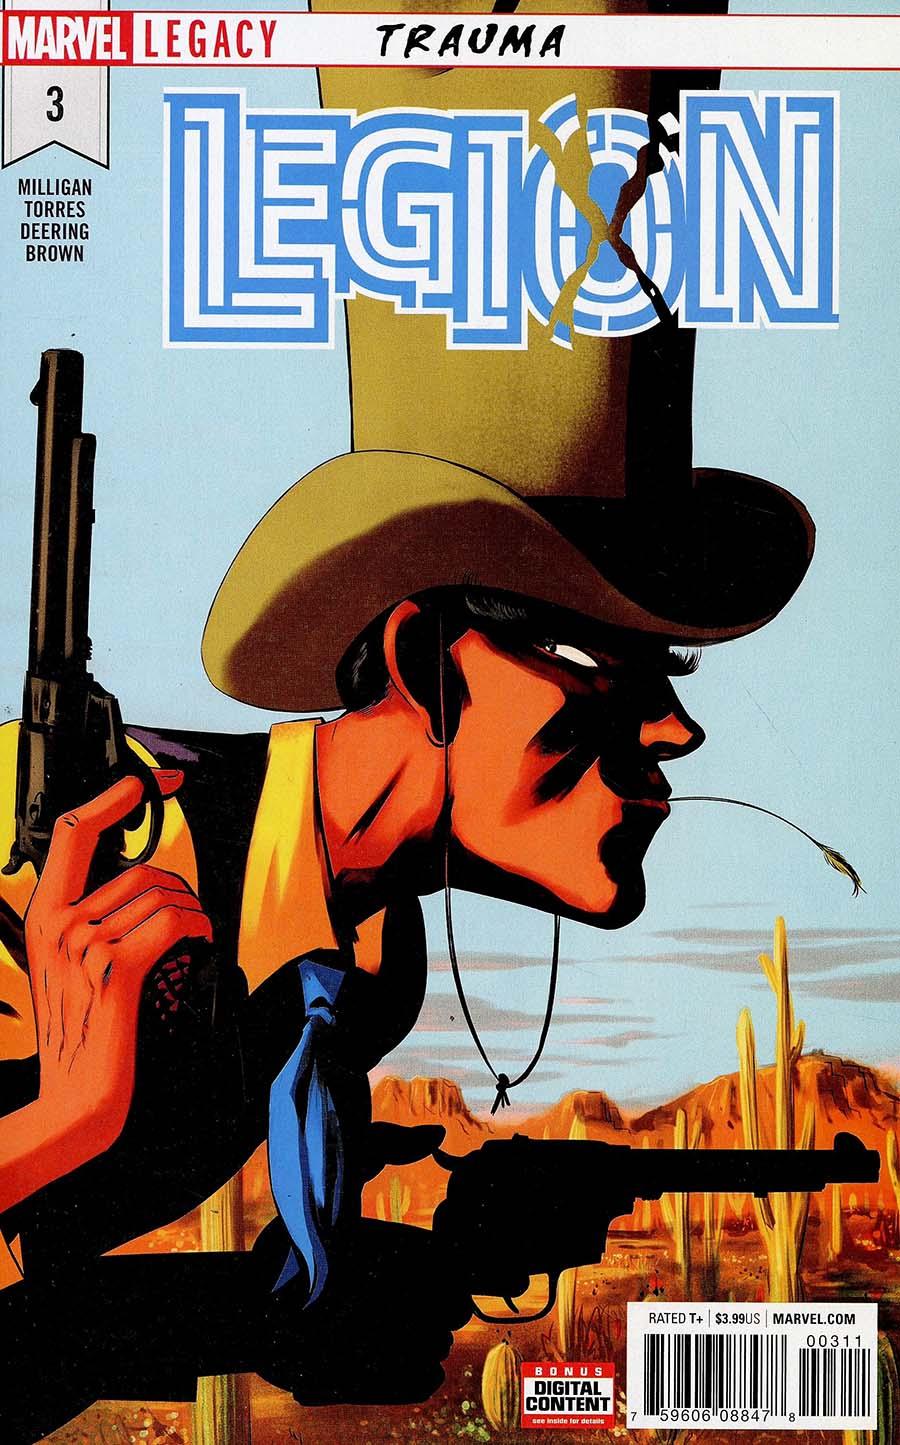 Legion (Marvel) #3 (Marvel Legacy Tie-In)